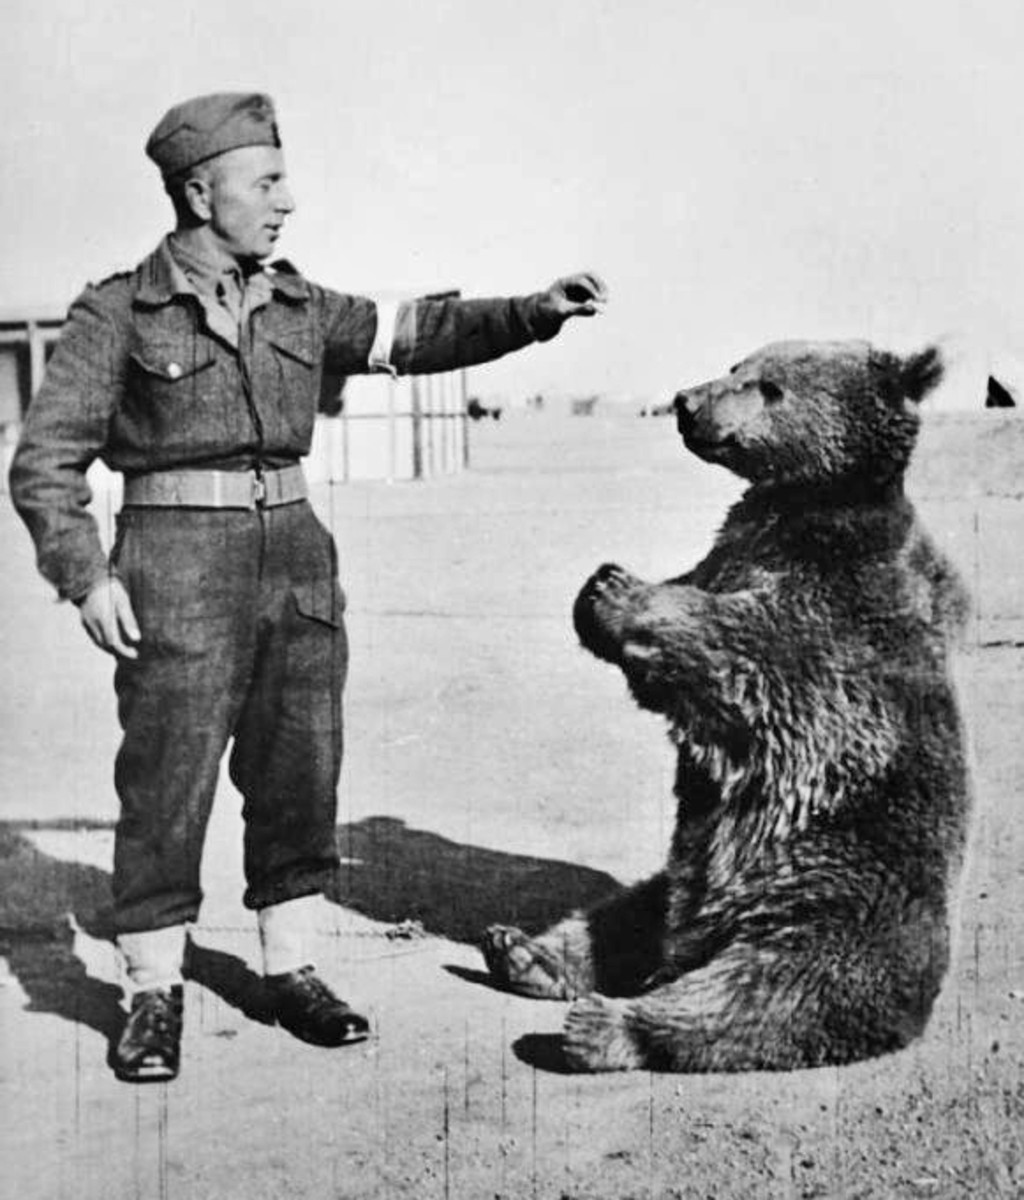 Wojtek with one of his handlers.